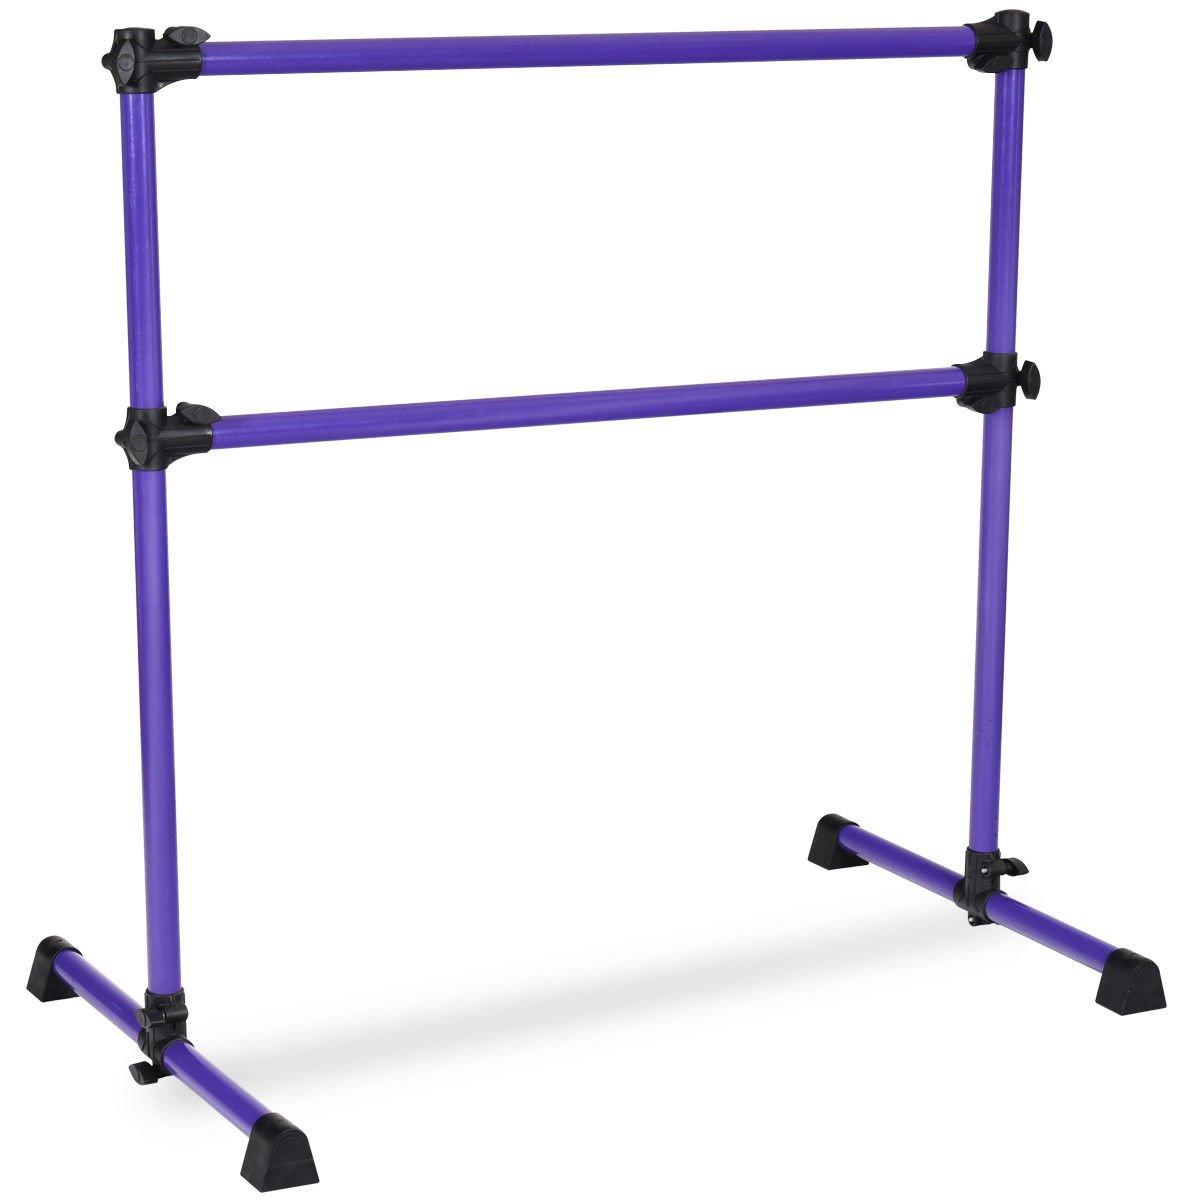 fdinspirationパープル4 ft調節可能なバレエBarreポータブルダブル自立ダンスバー